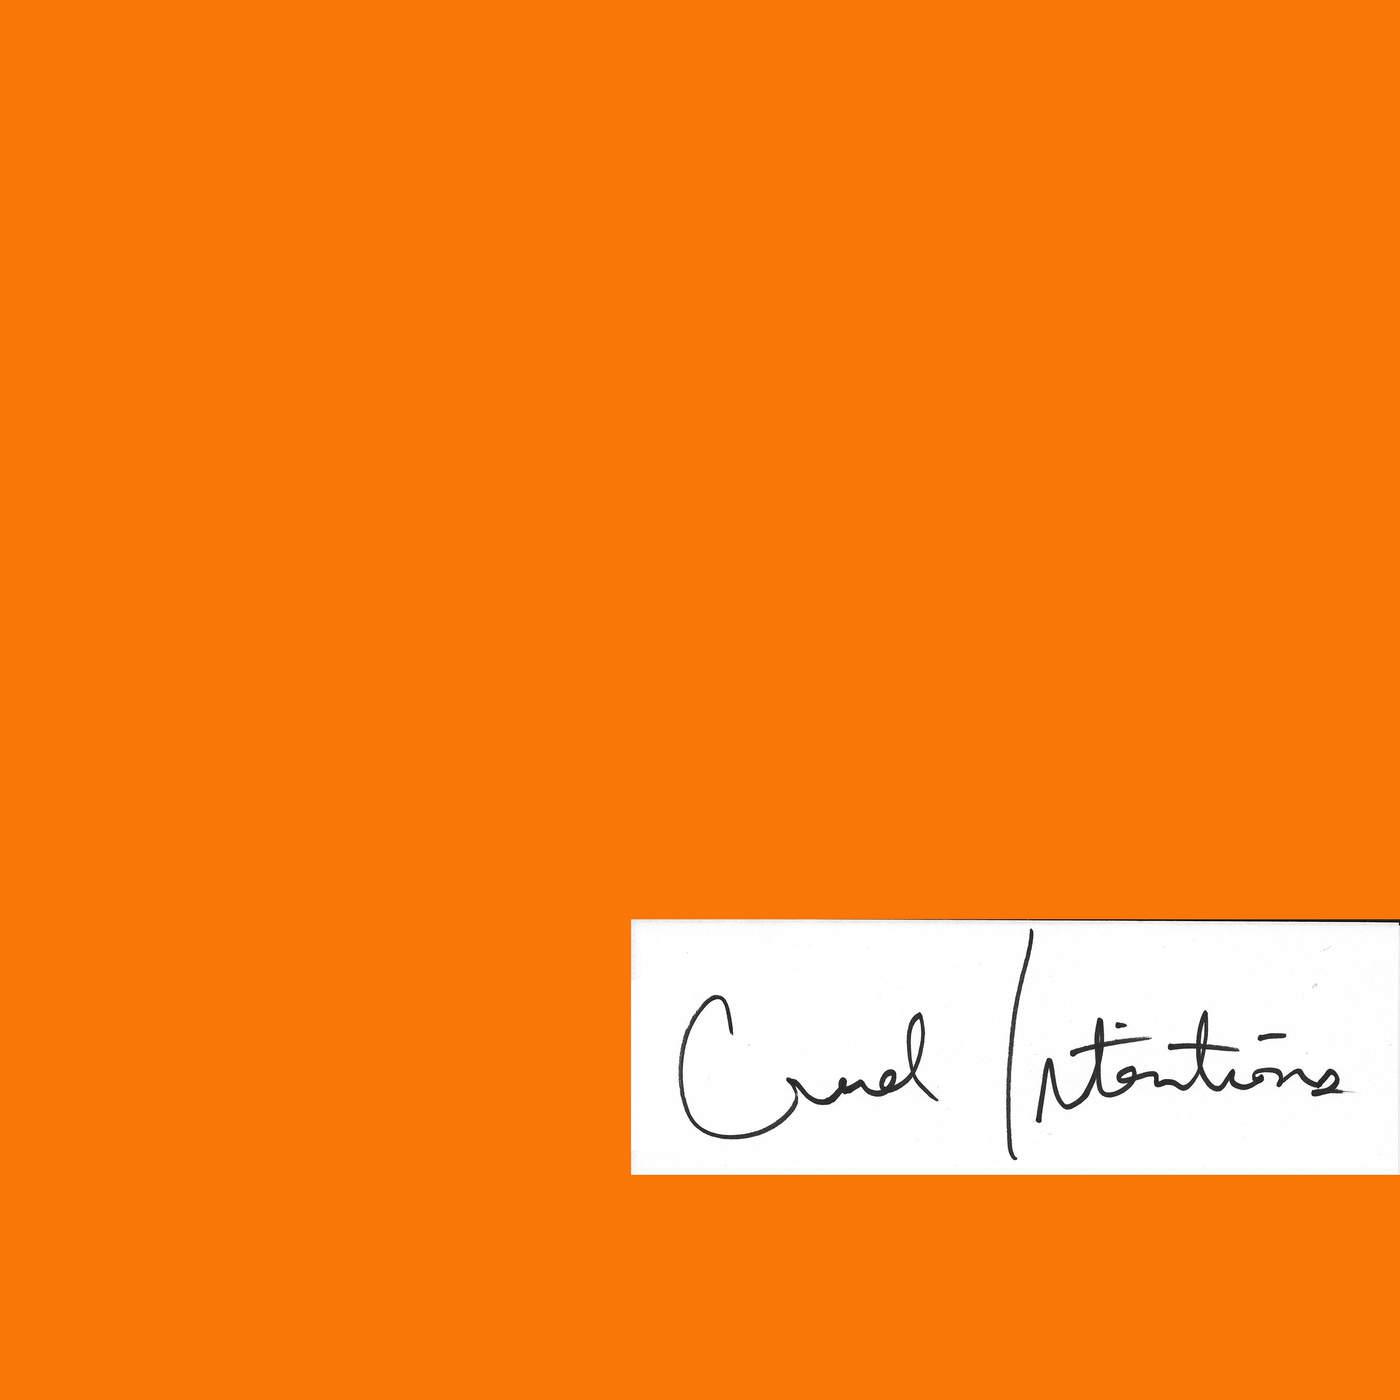 JMSN - Cruel Intentions - Single Cover